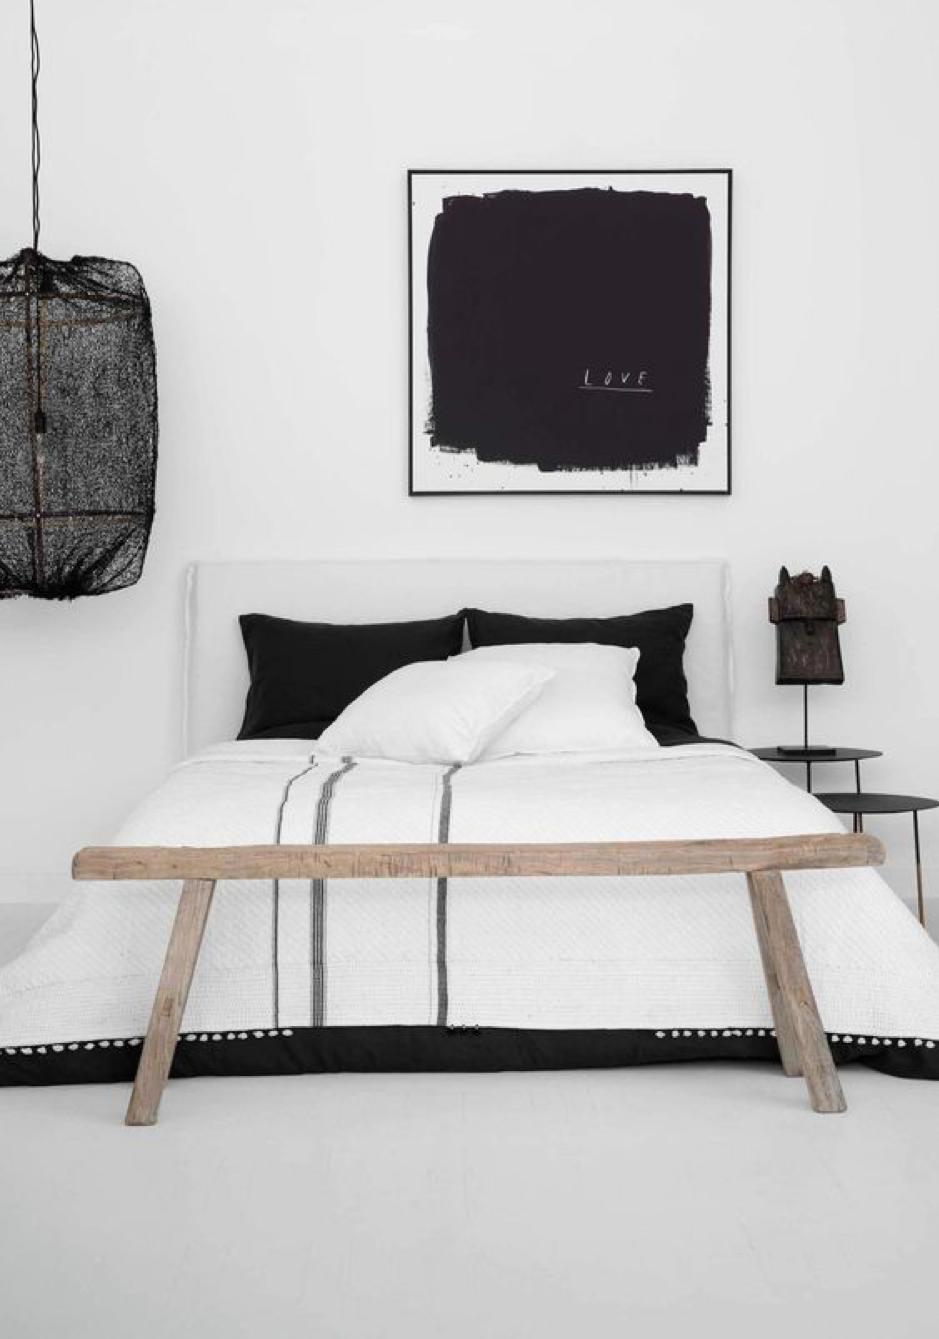 Monochrome Bedroom Envy | Pamela Makin's residence in Whale Beach. Image via Felix Forest